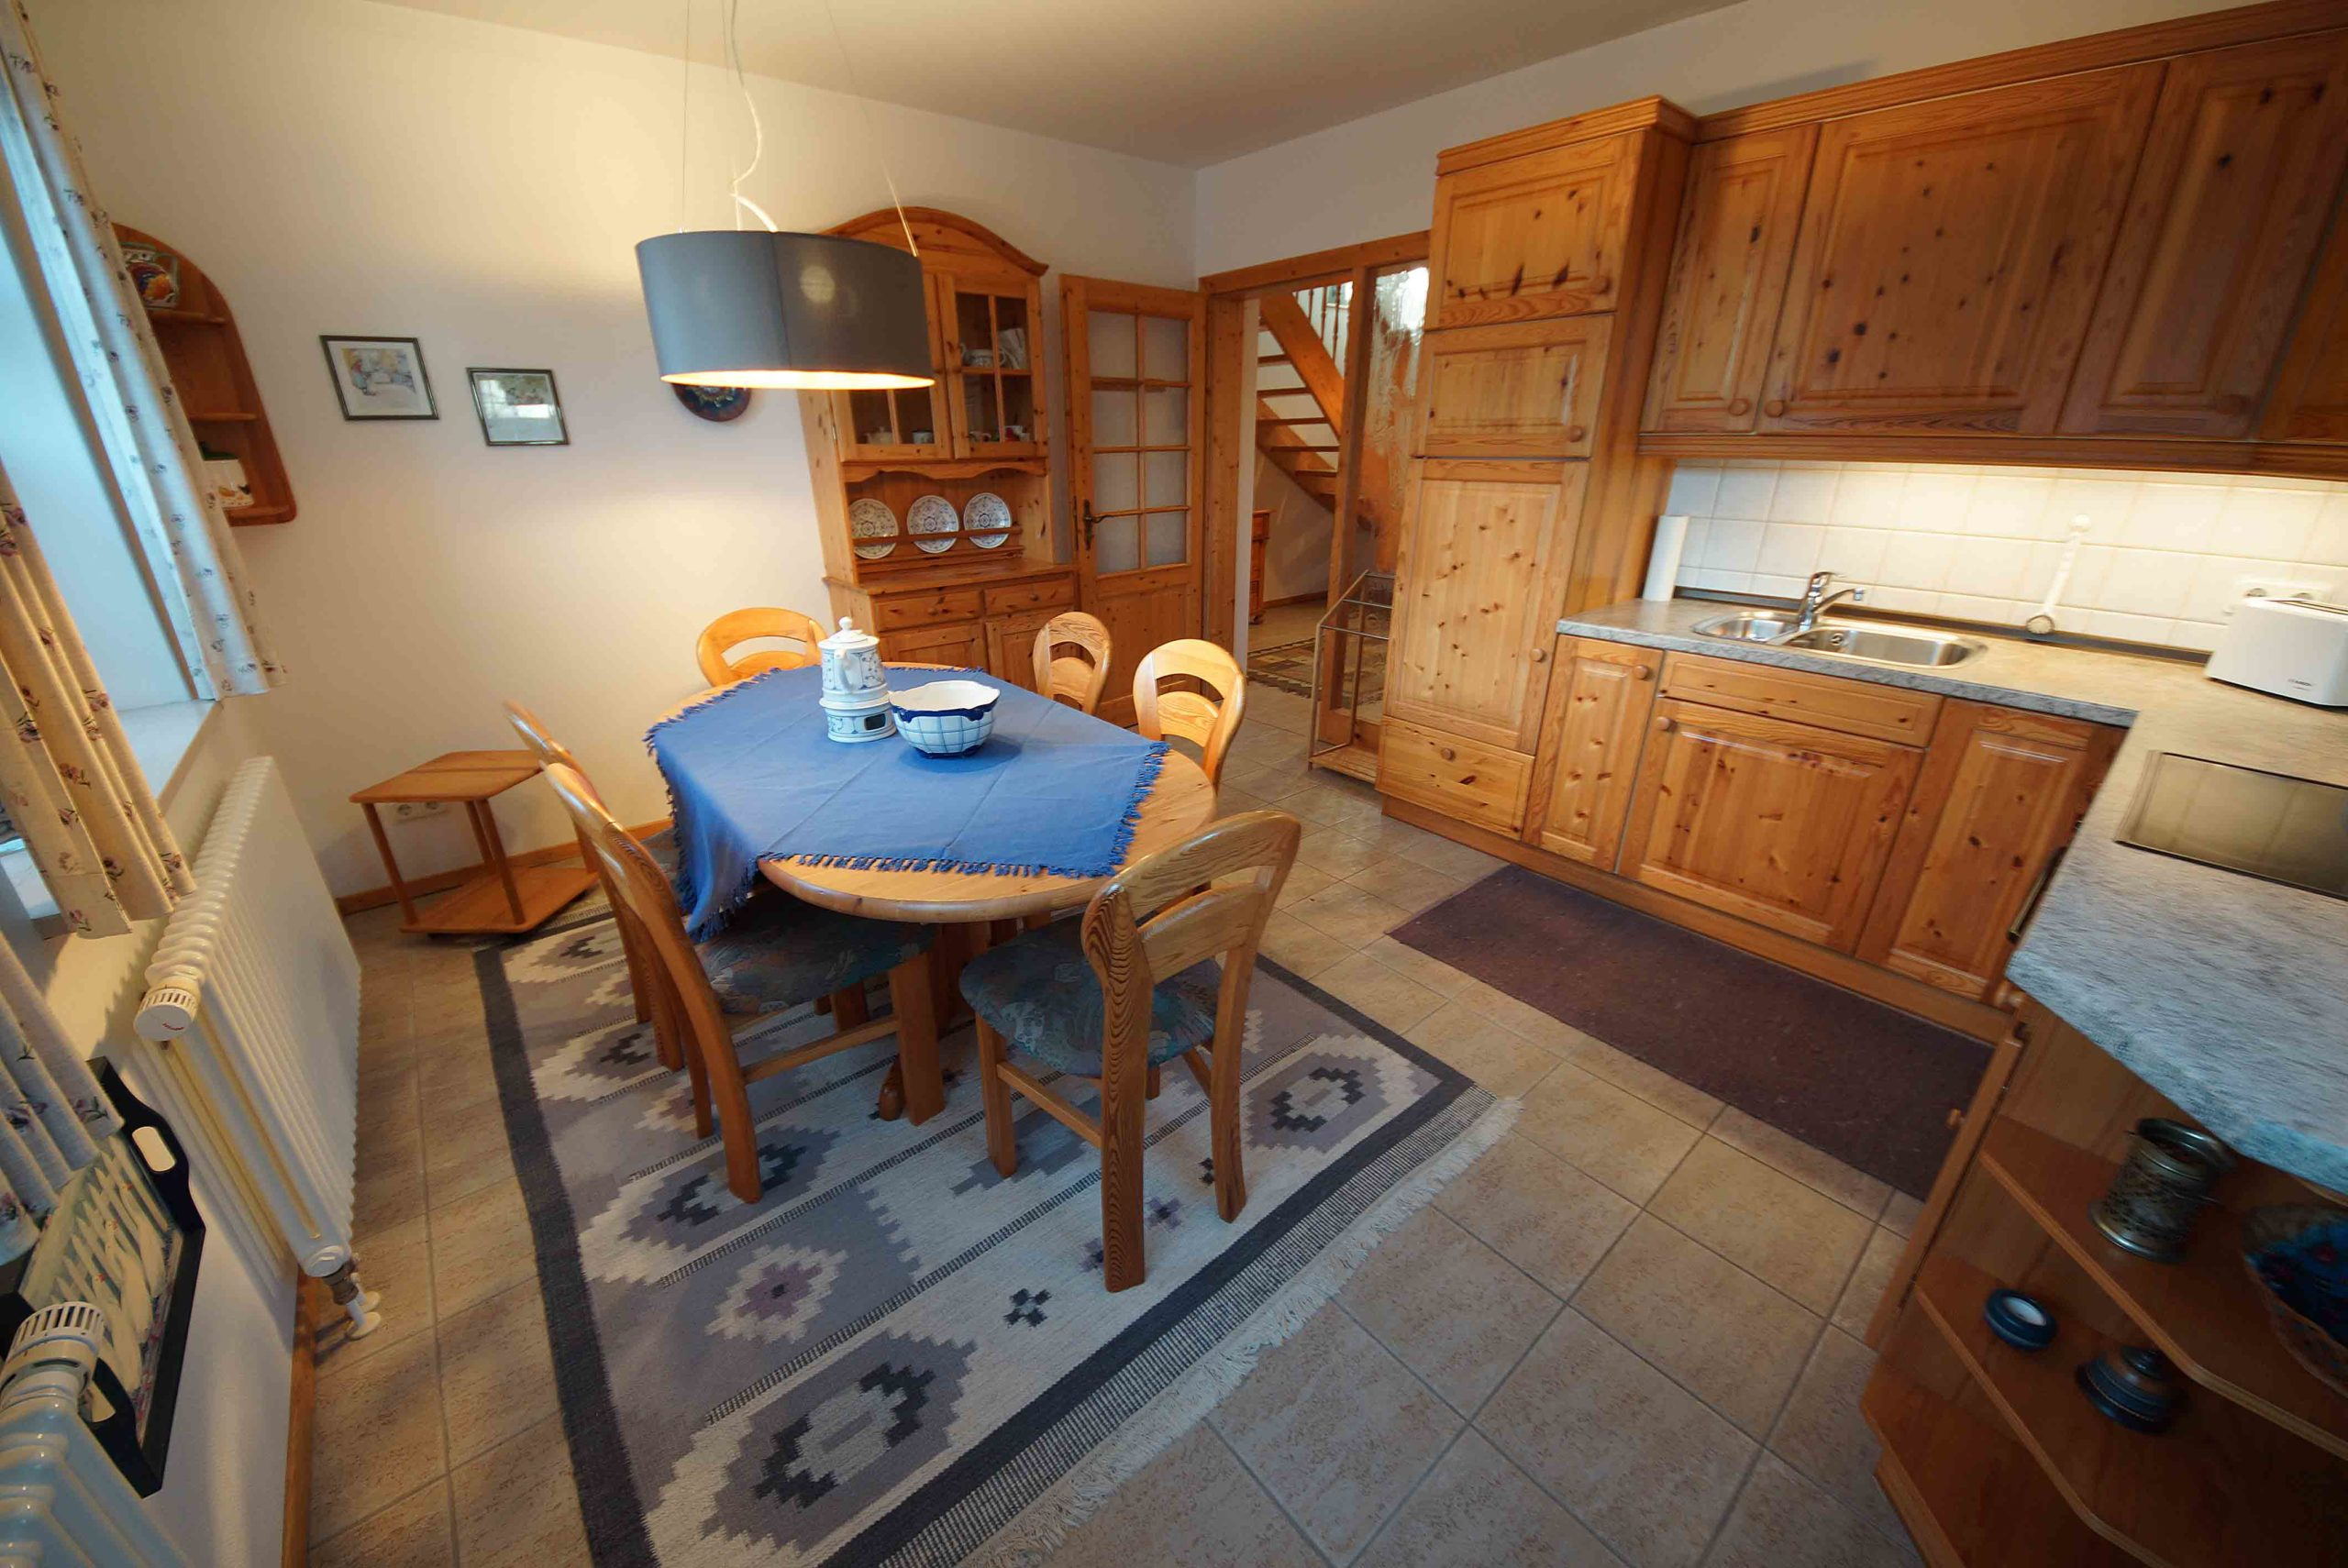 Prerow Ferienhaus Familienglück - Ferienservice Prerow, Grünestr. 7b 18375 Ostseebad Prerow